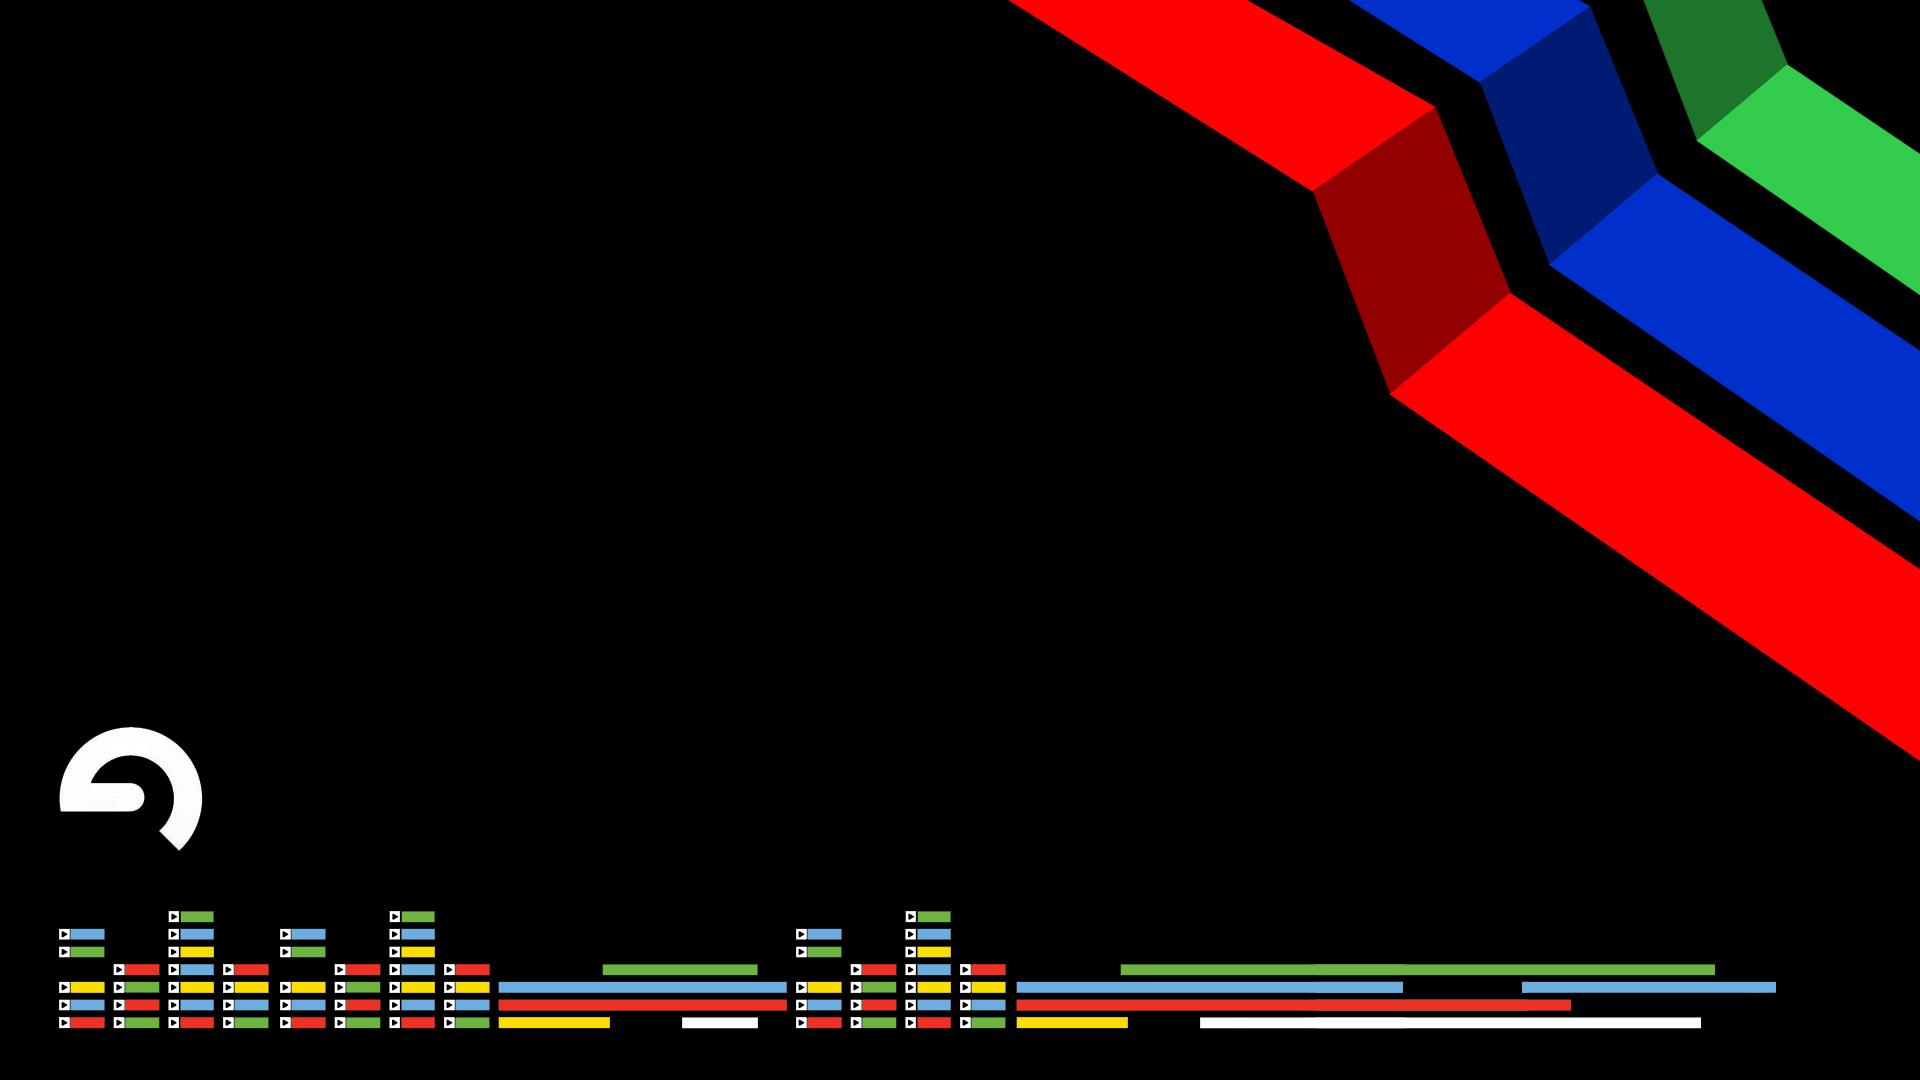 ableton live background 1080p by ryanpridgeon customization wallpaper 1920x1080